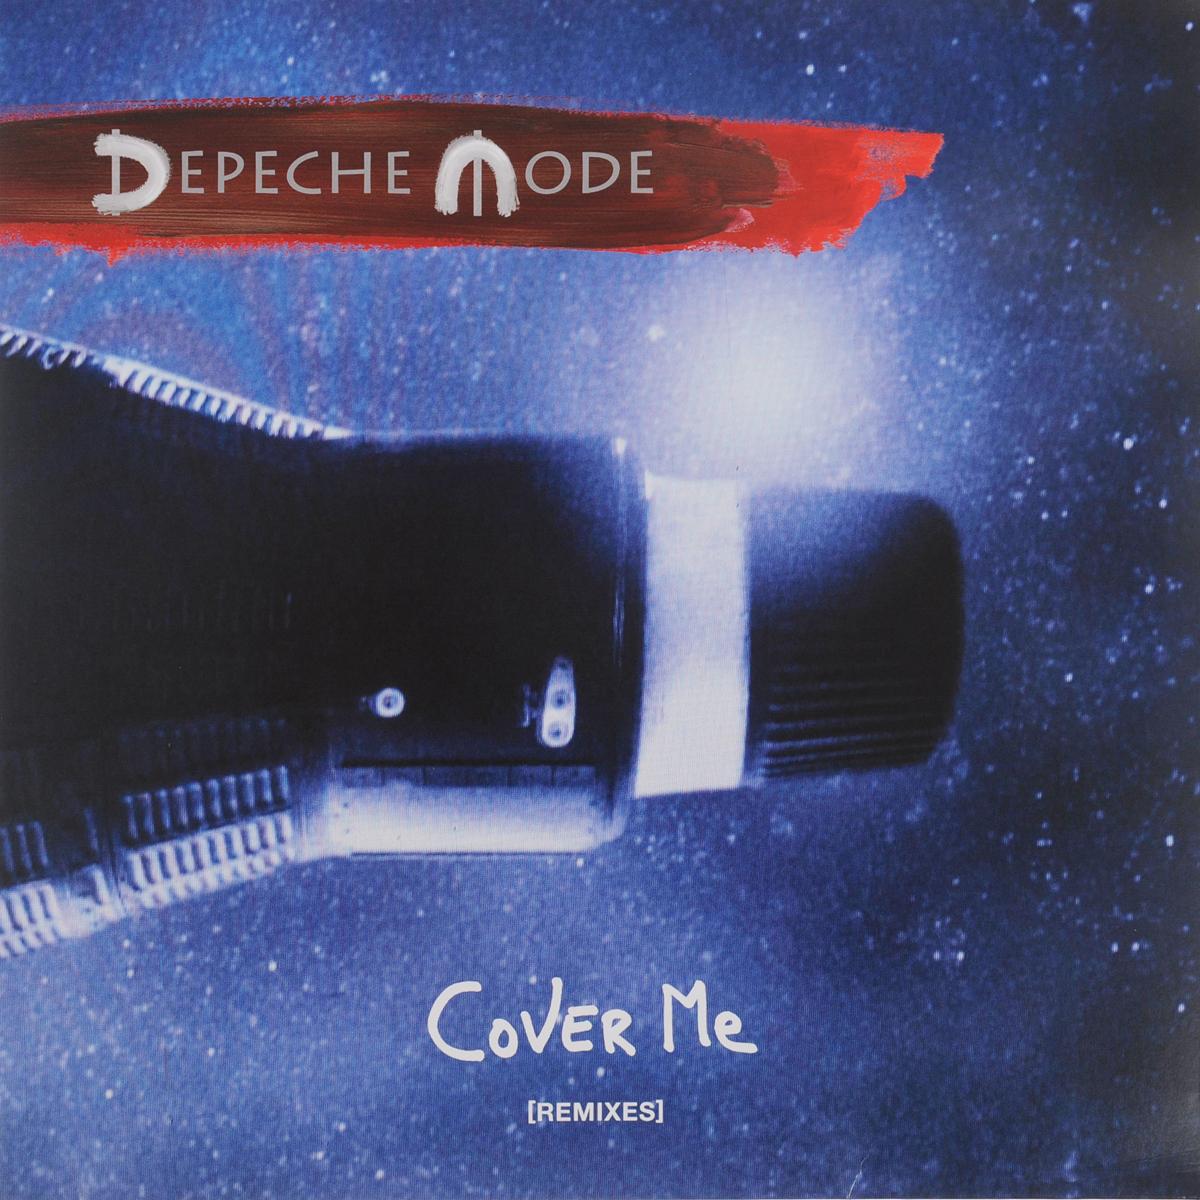 Depeche Mode Depeche Mode. Cover Me (Remixes) (2 LP) tale of us endless remixes 2 lp